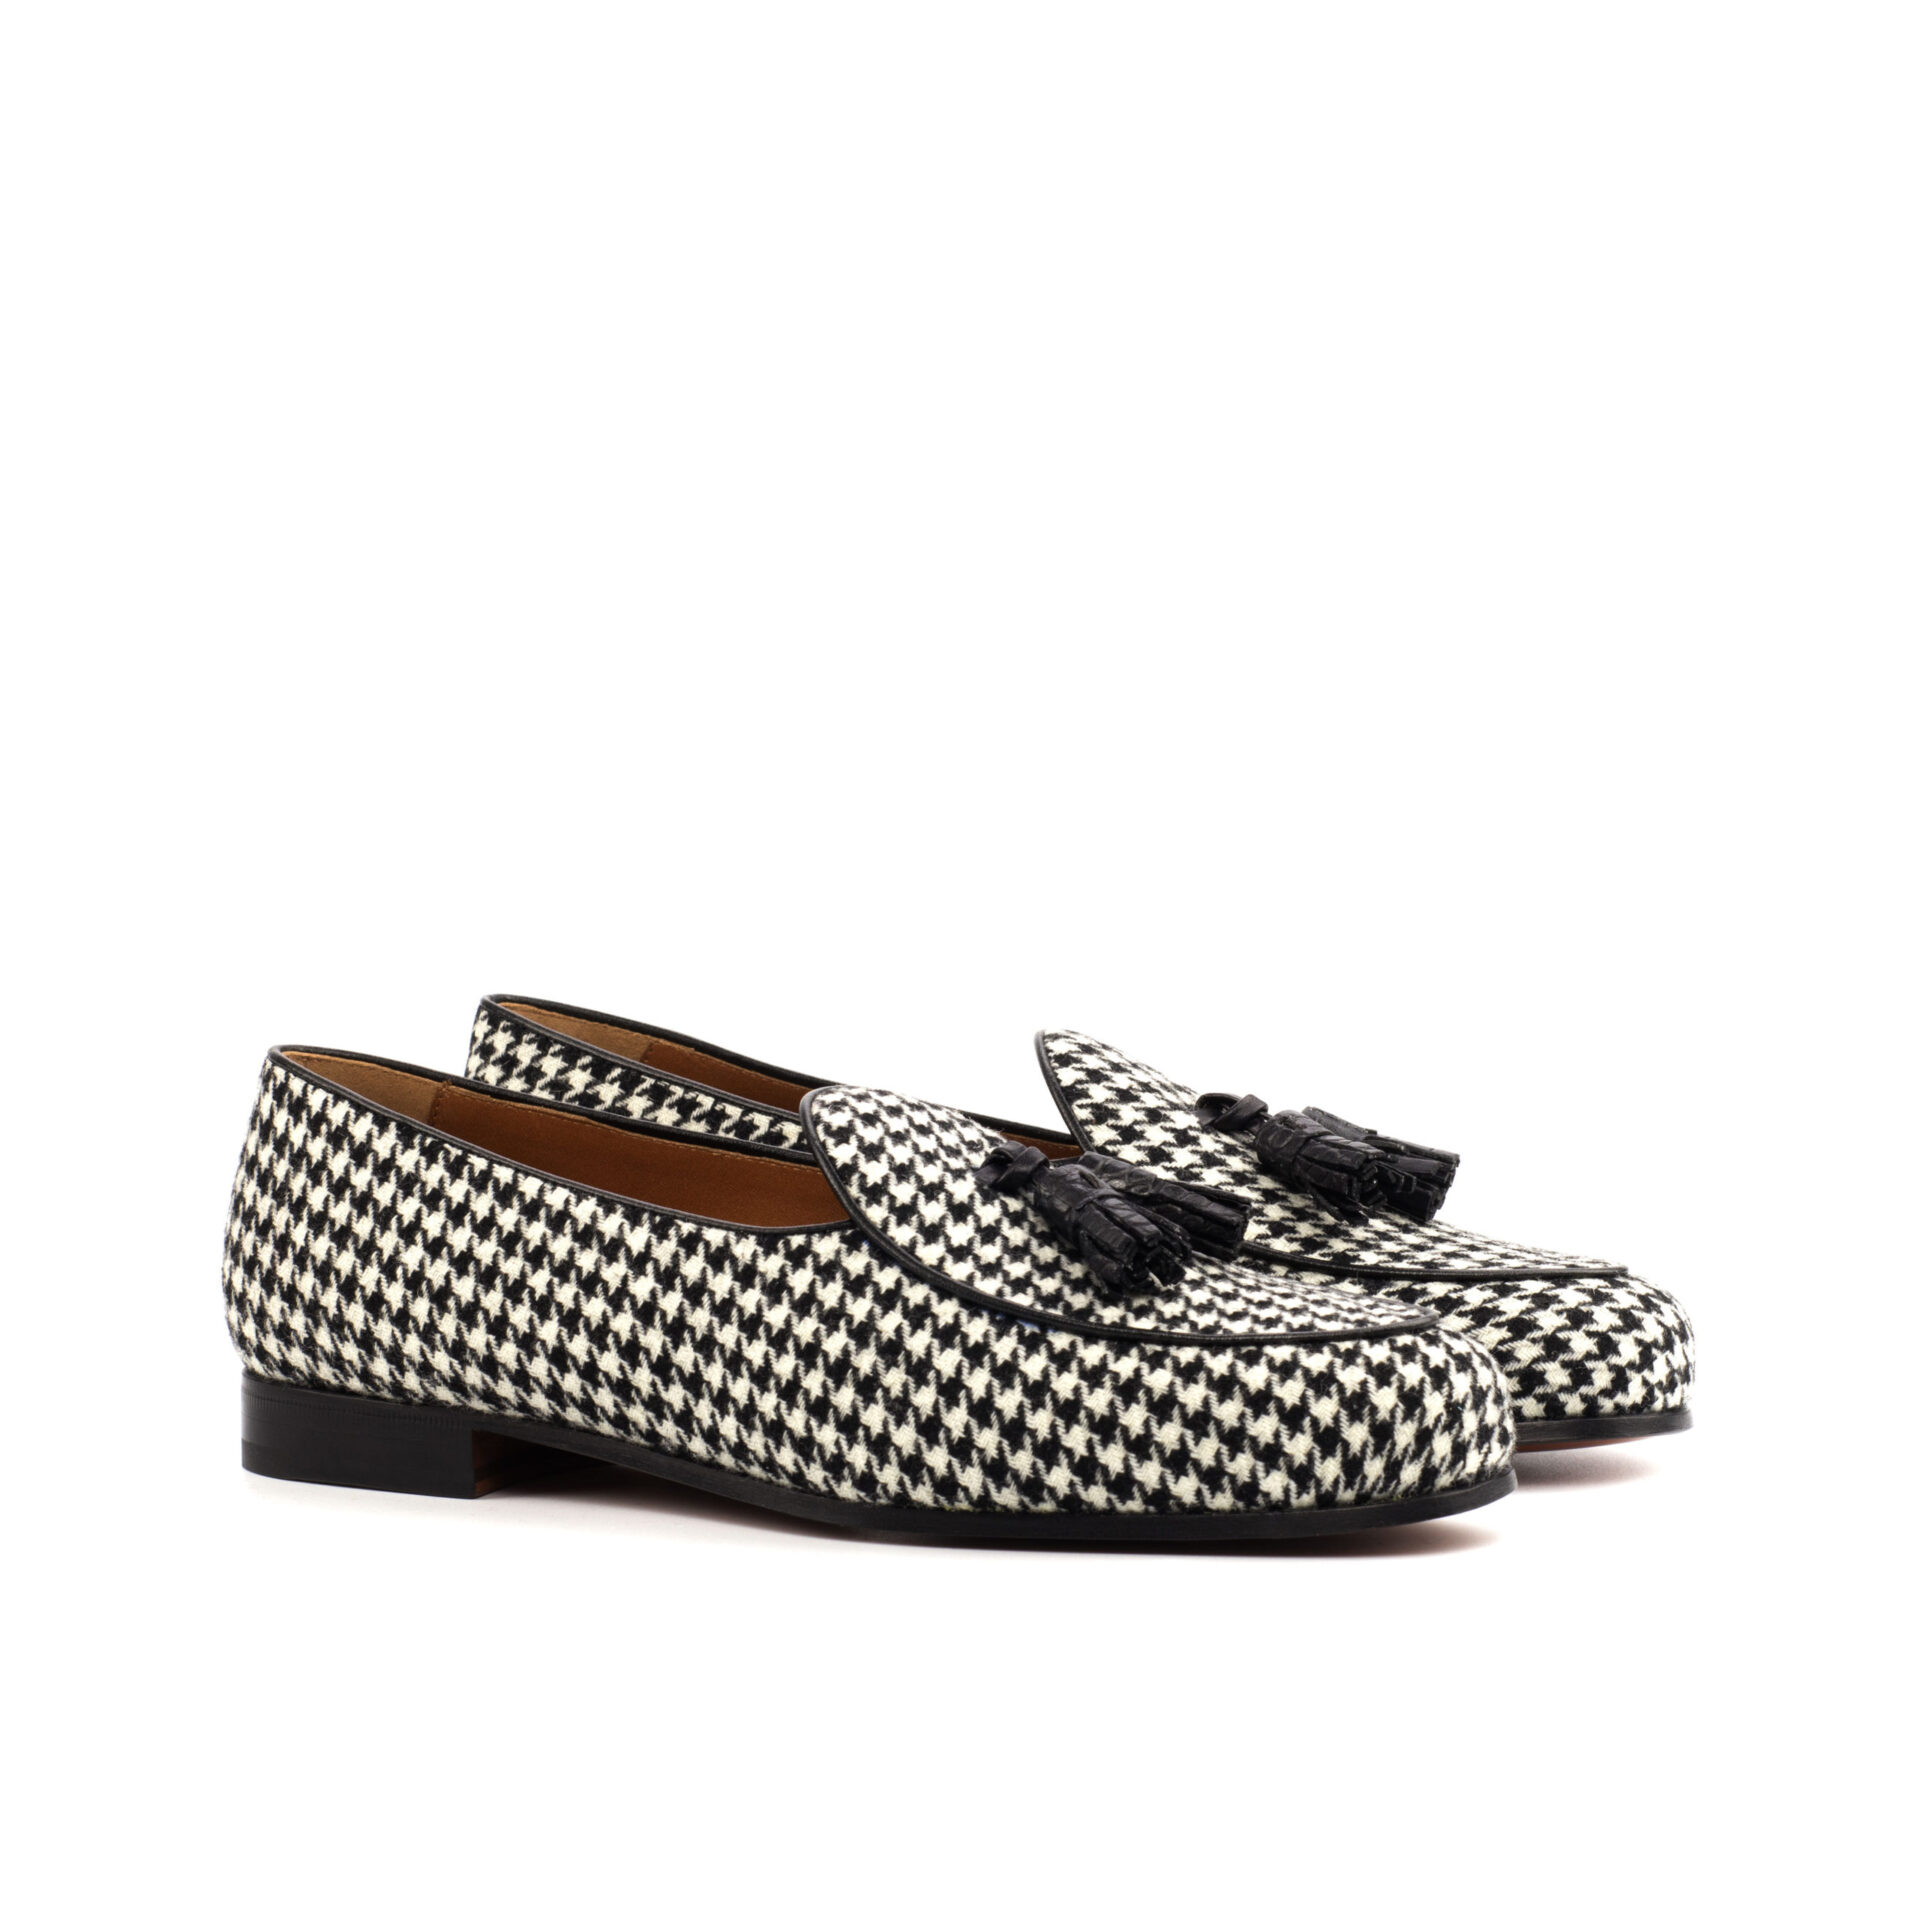 Belgian Slipper Shoe